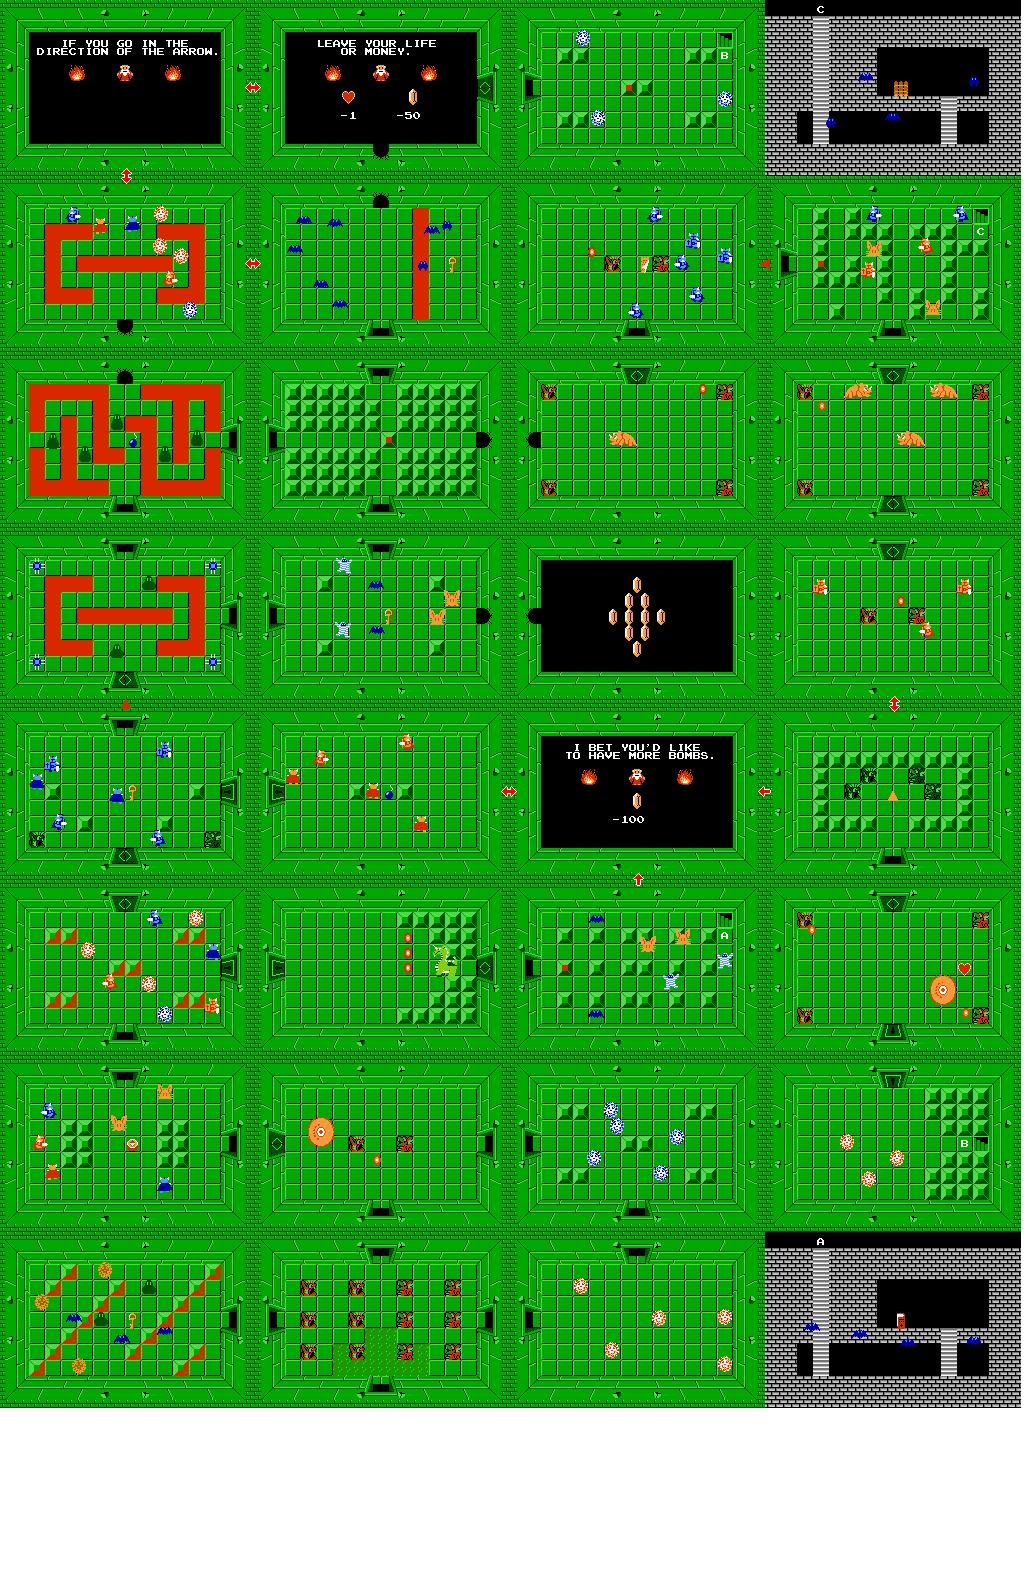 Zelda Second Quest Level 4 : zelda, second, quest, level, Vremea, Moldovita, Suceava, Woodlessness.critialupdate.site